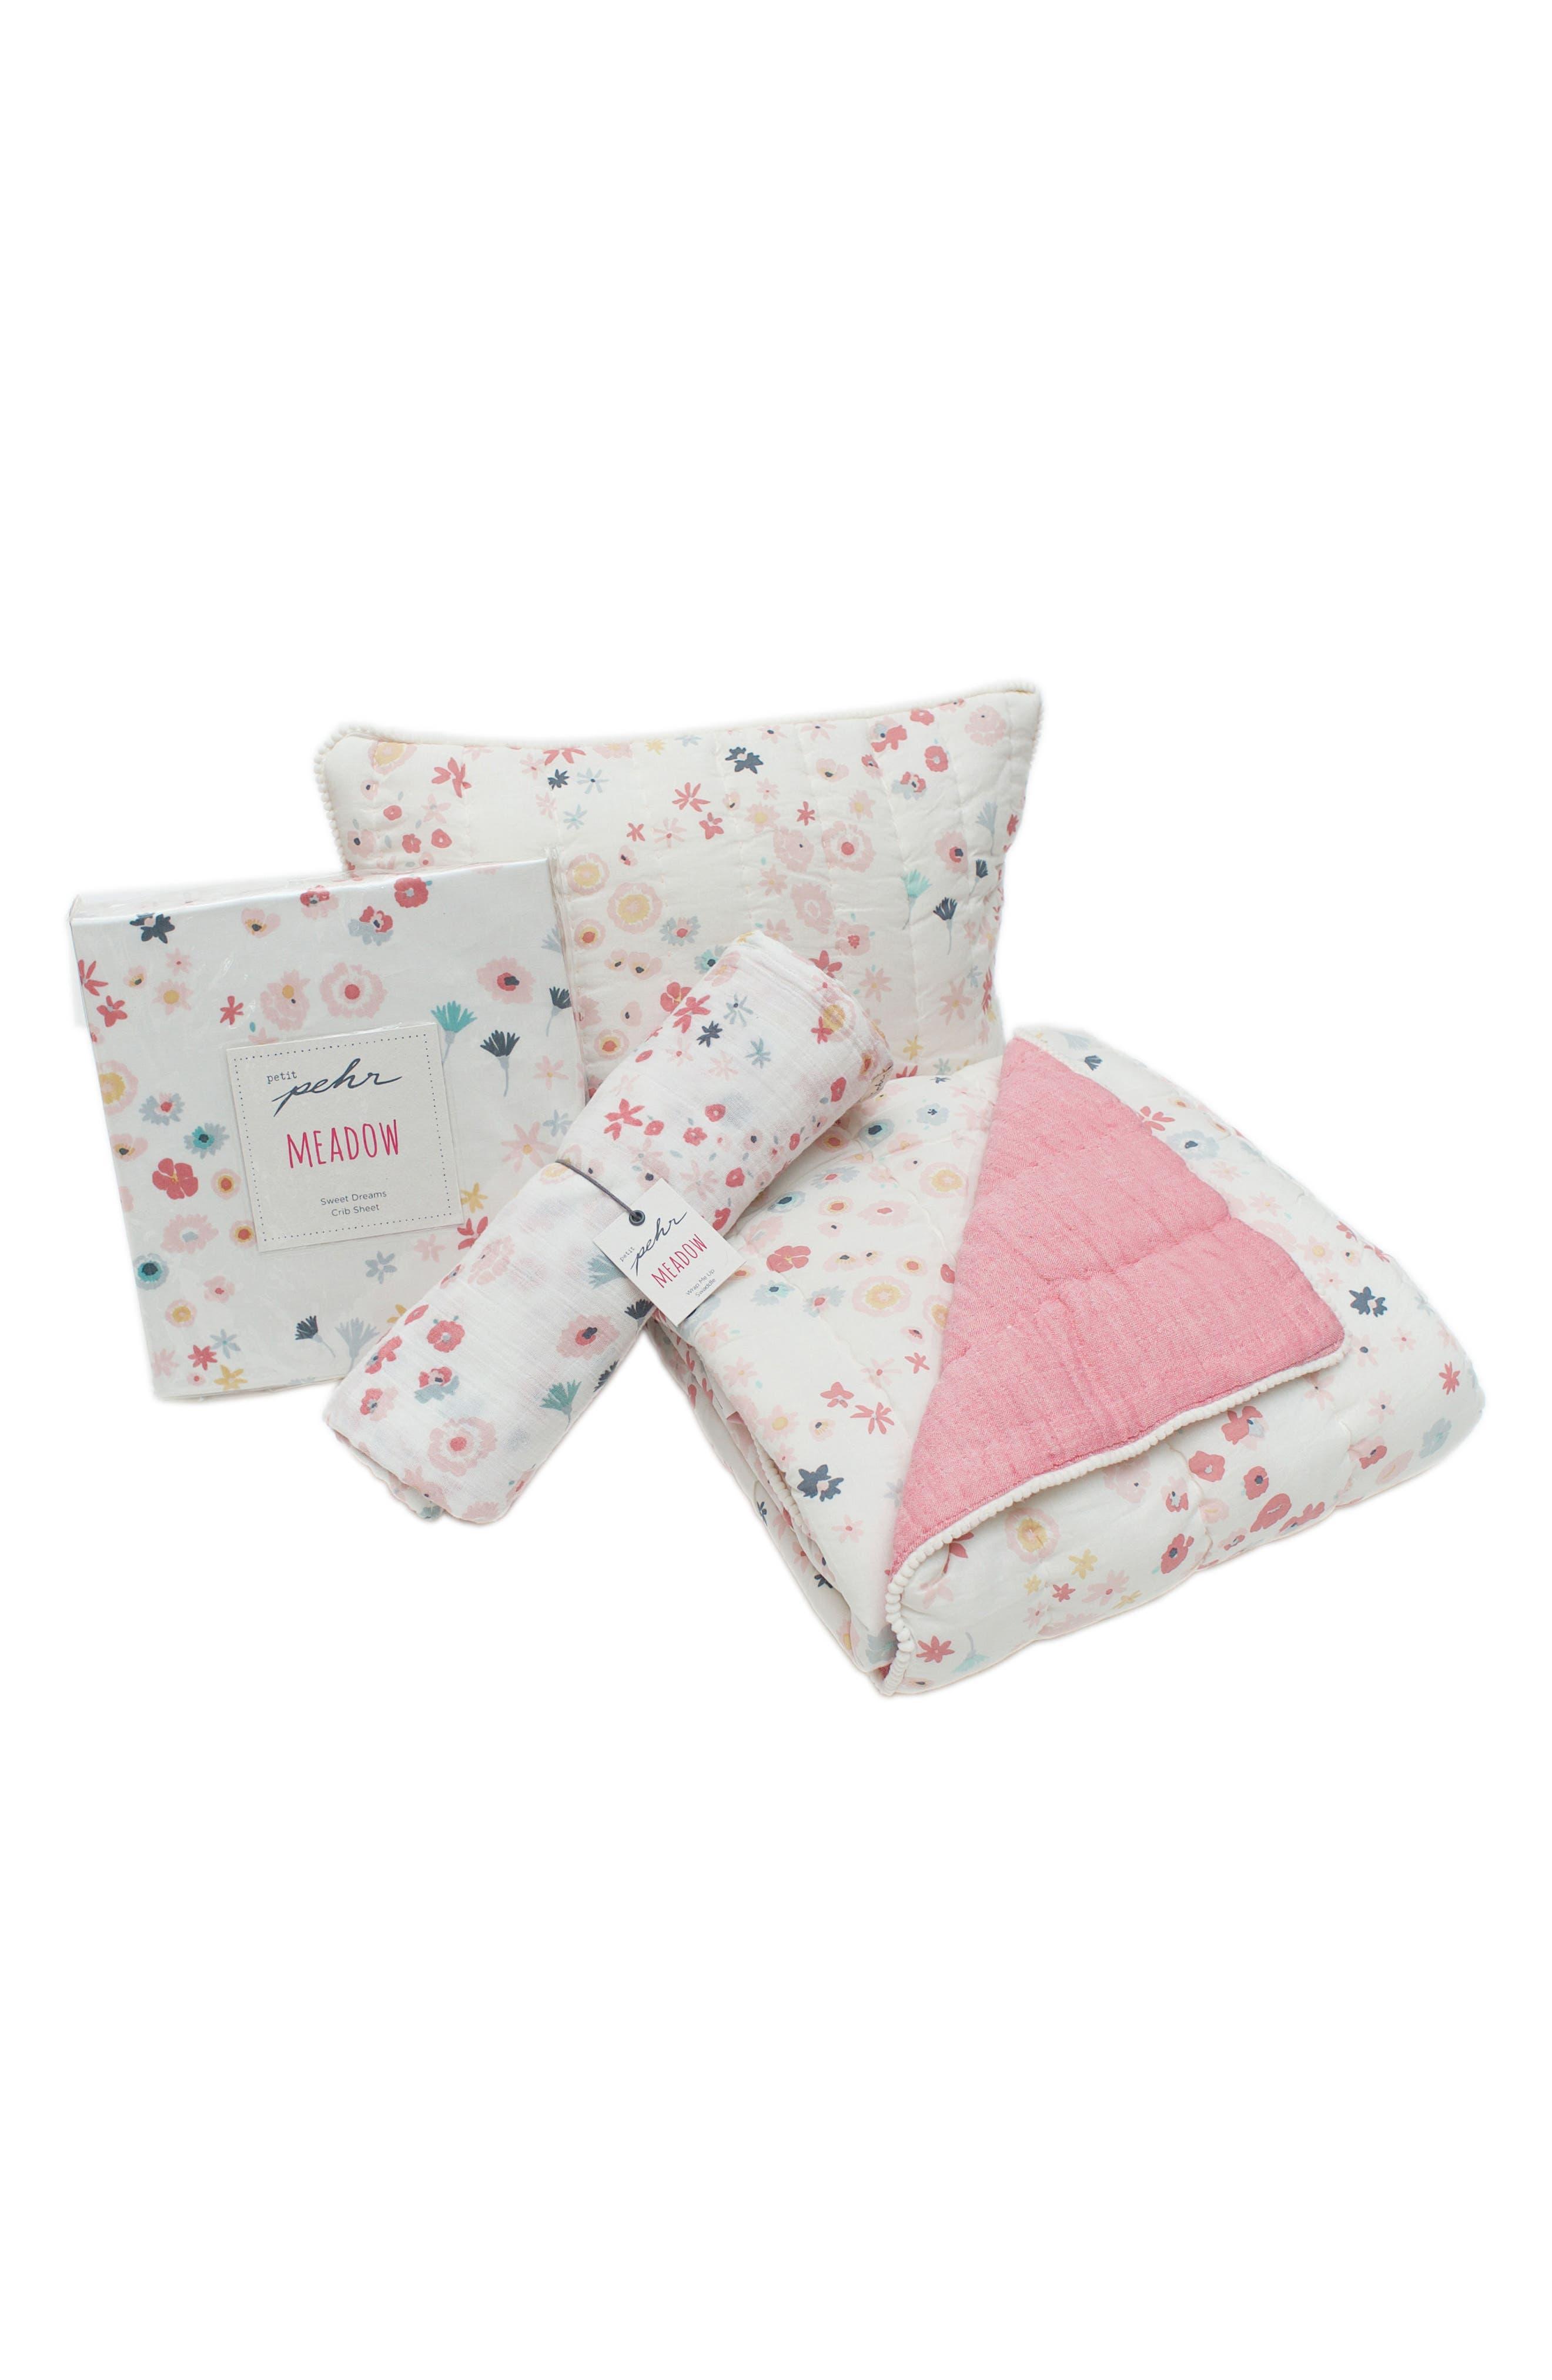 Showers Crib Sheet, Swaddle, Blanket & Pillow Set,                             Main thumbnail 1, color,                             PINK